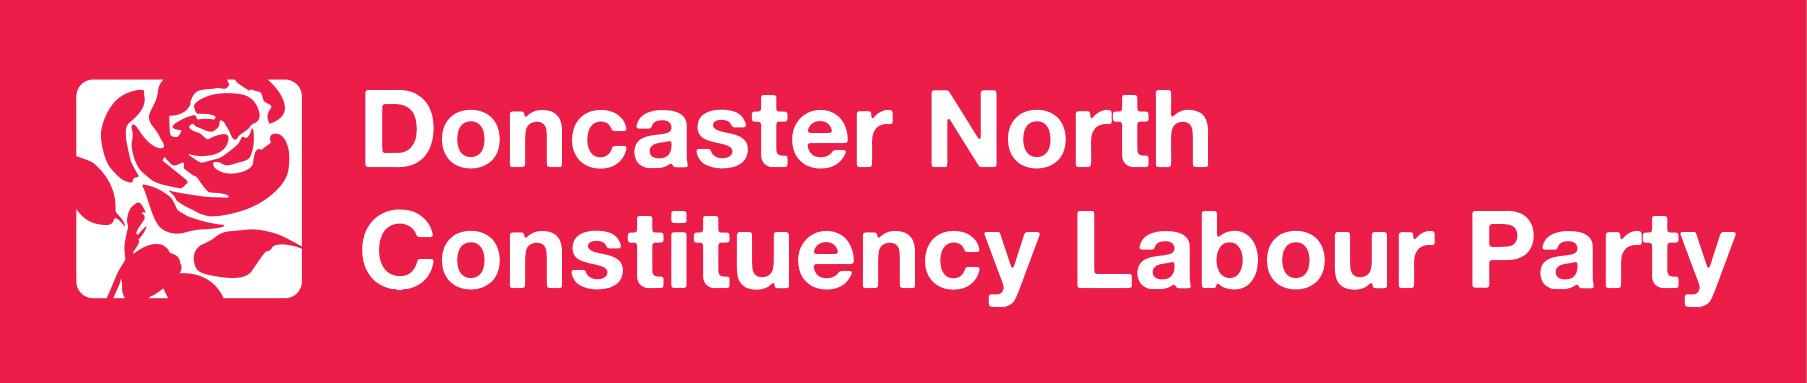 DoncasterNorthCLP_Logo.jpg